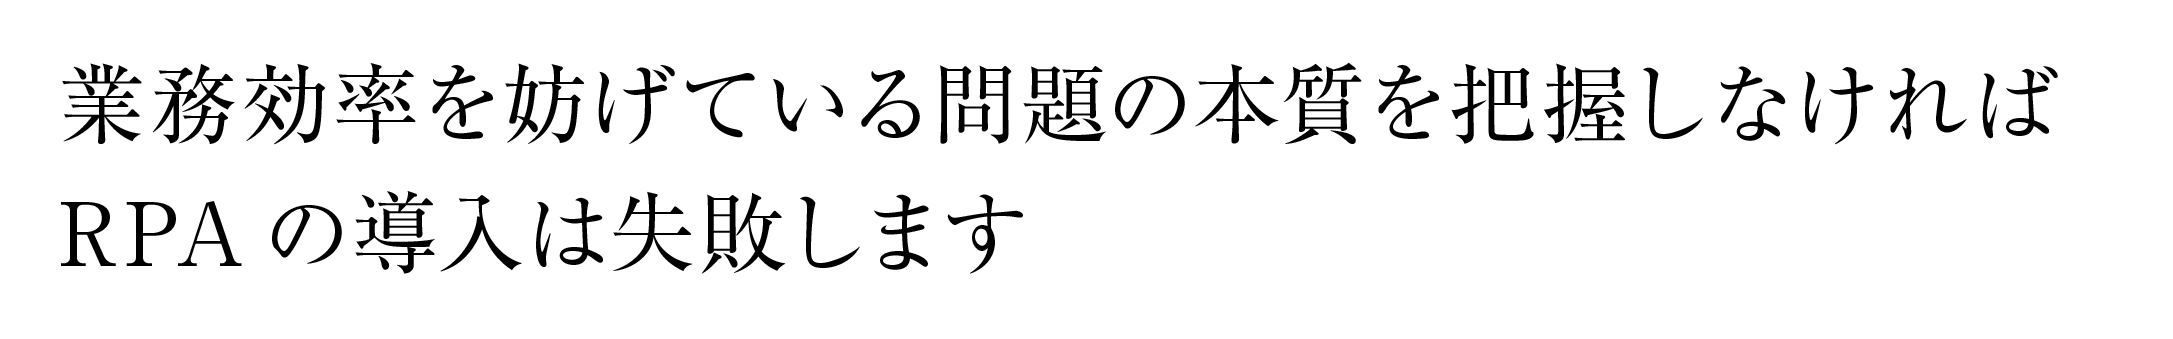 f:id:sky-pca:20191025165748p:plain